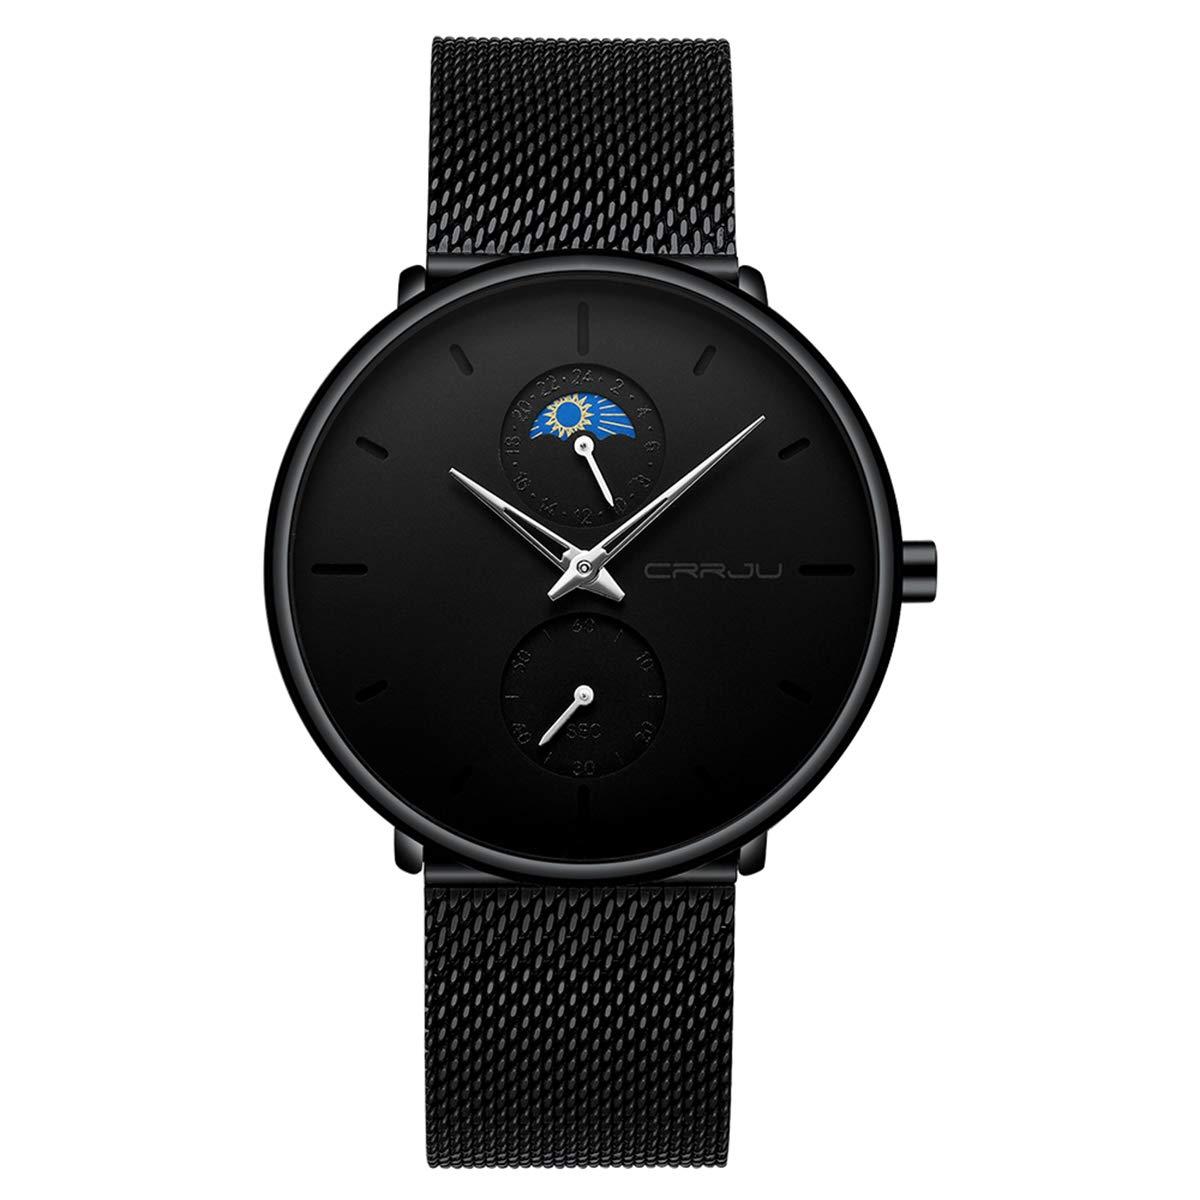 Watches Men's Watch Deep Blue/Black Watch Ultra Thin Wrist Watches for Men Fashion Watch Waterproof Dress Stainless Steel Band